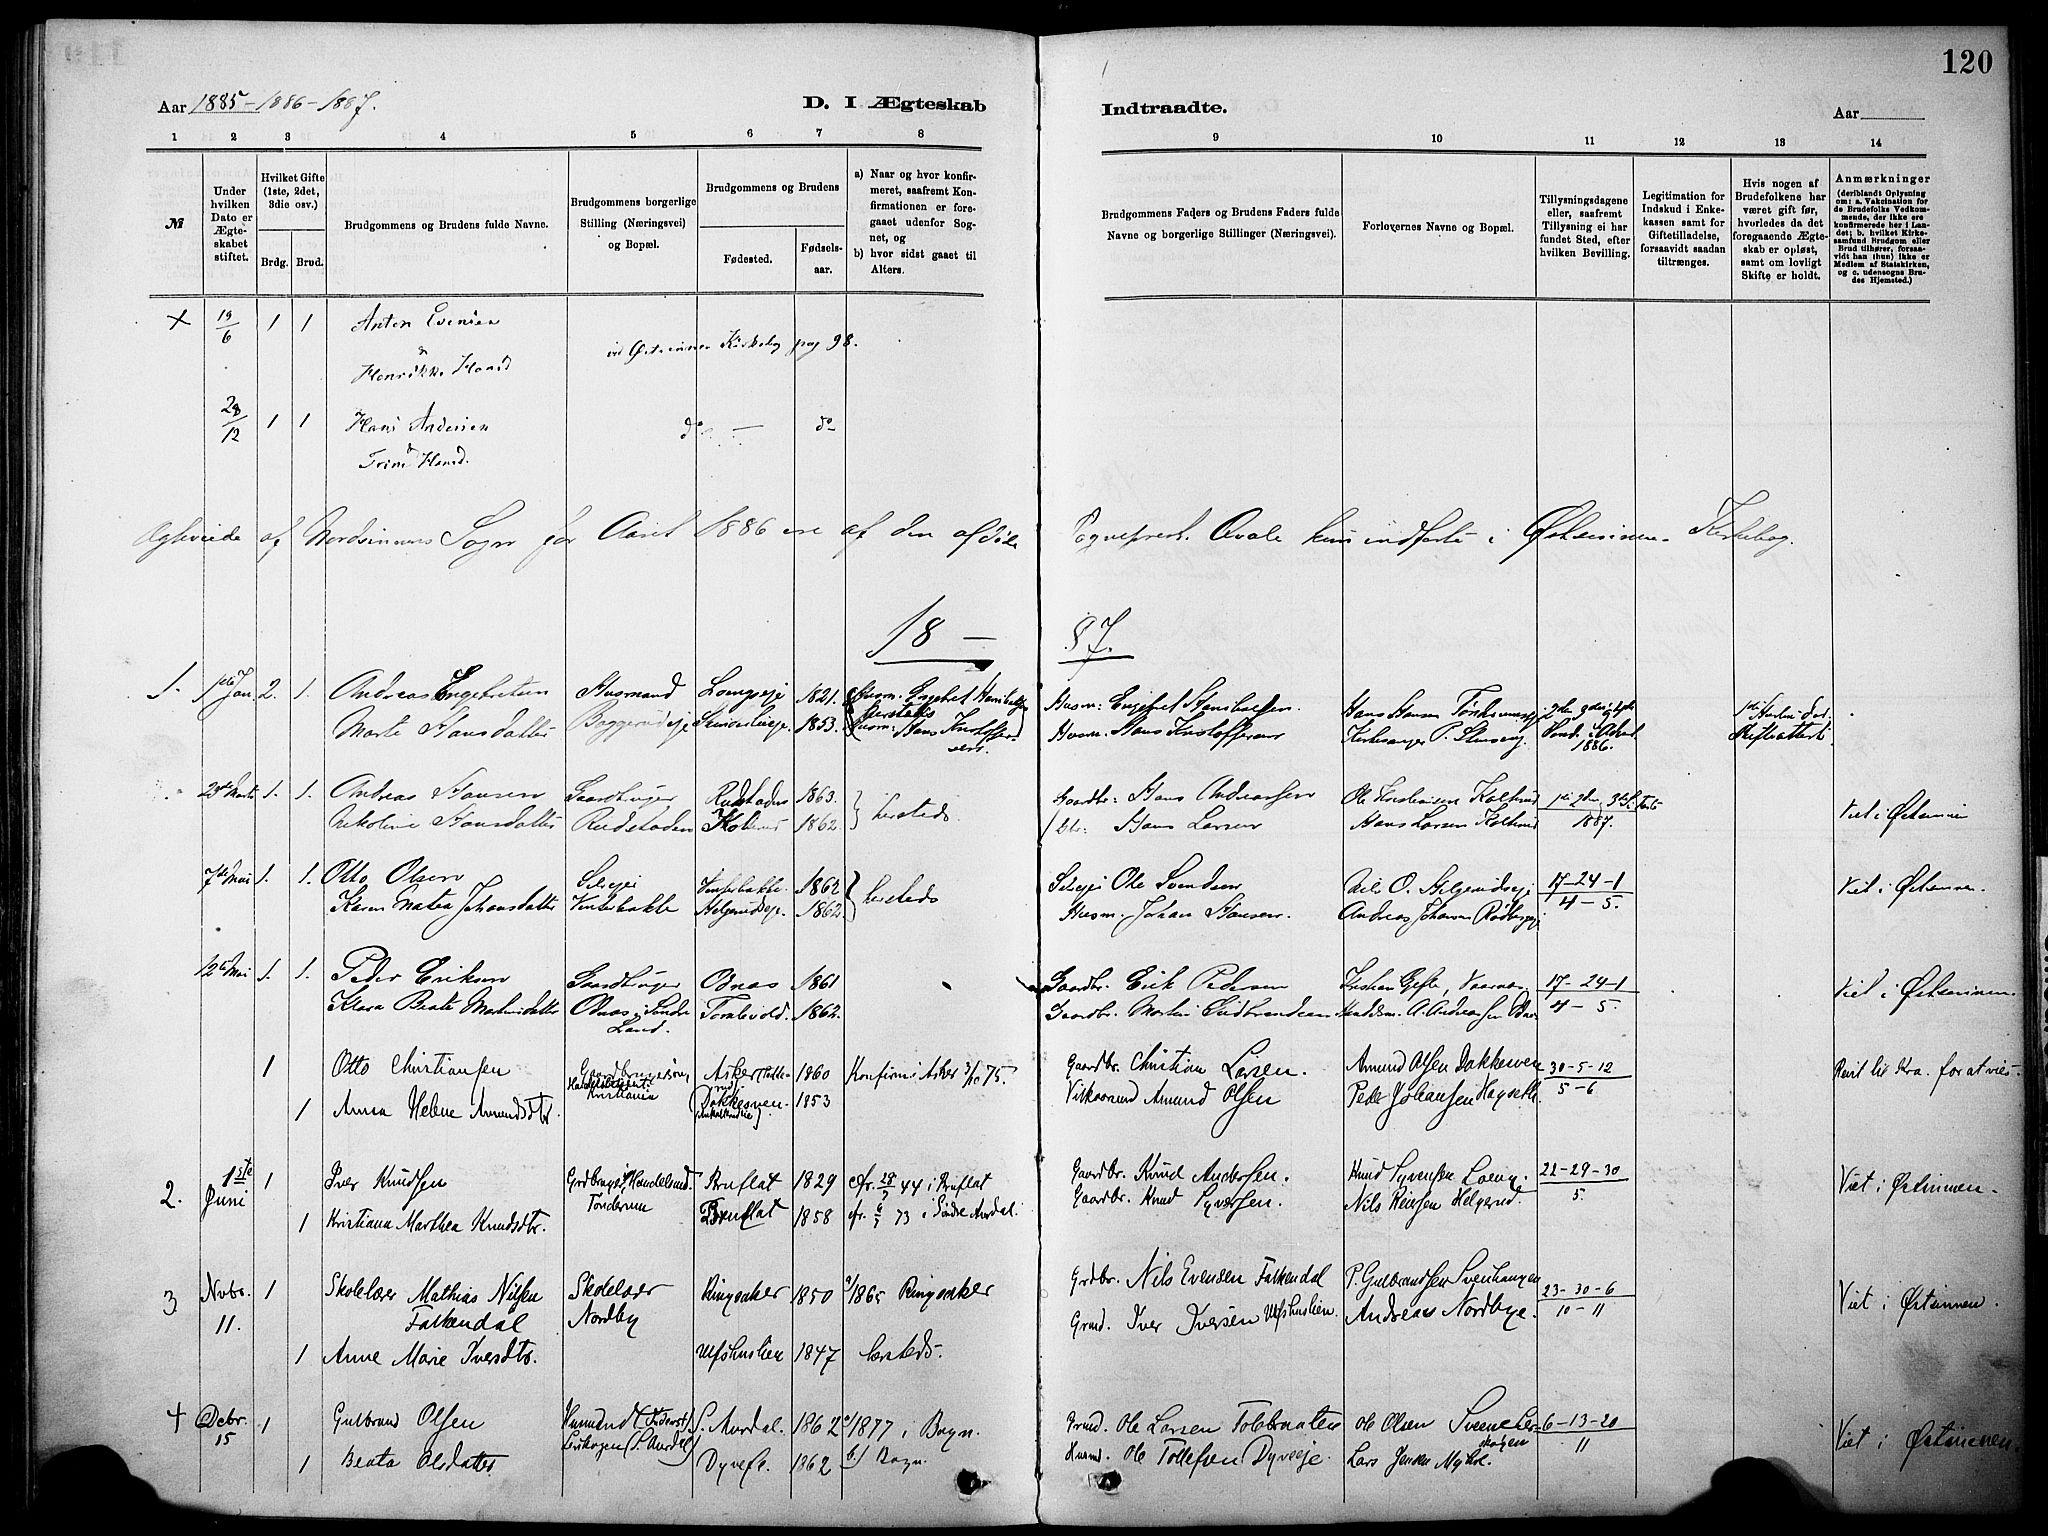 SAH, Nordre Land prestekontor, Ministerialbok nr. 5, 1882-1903, s. 120